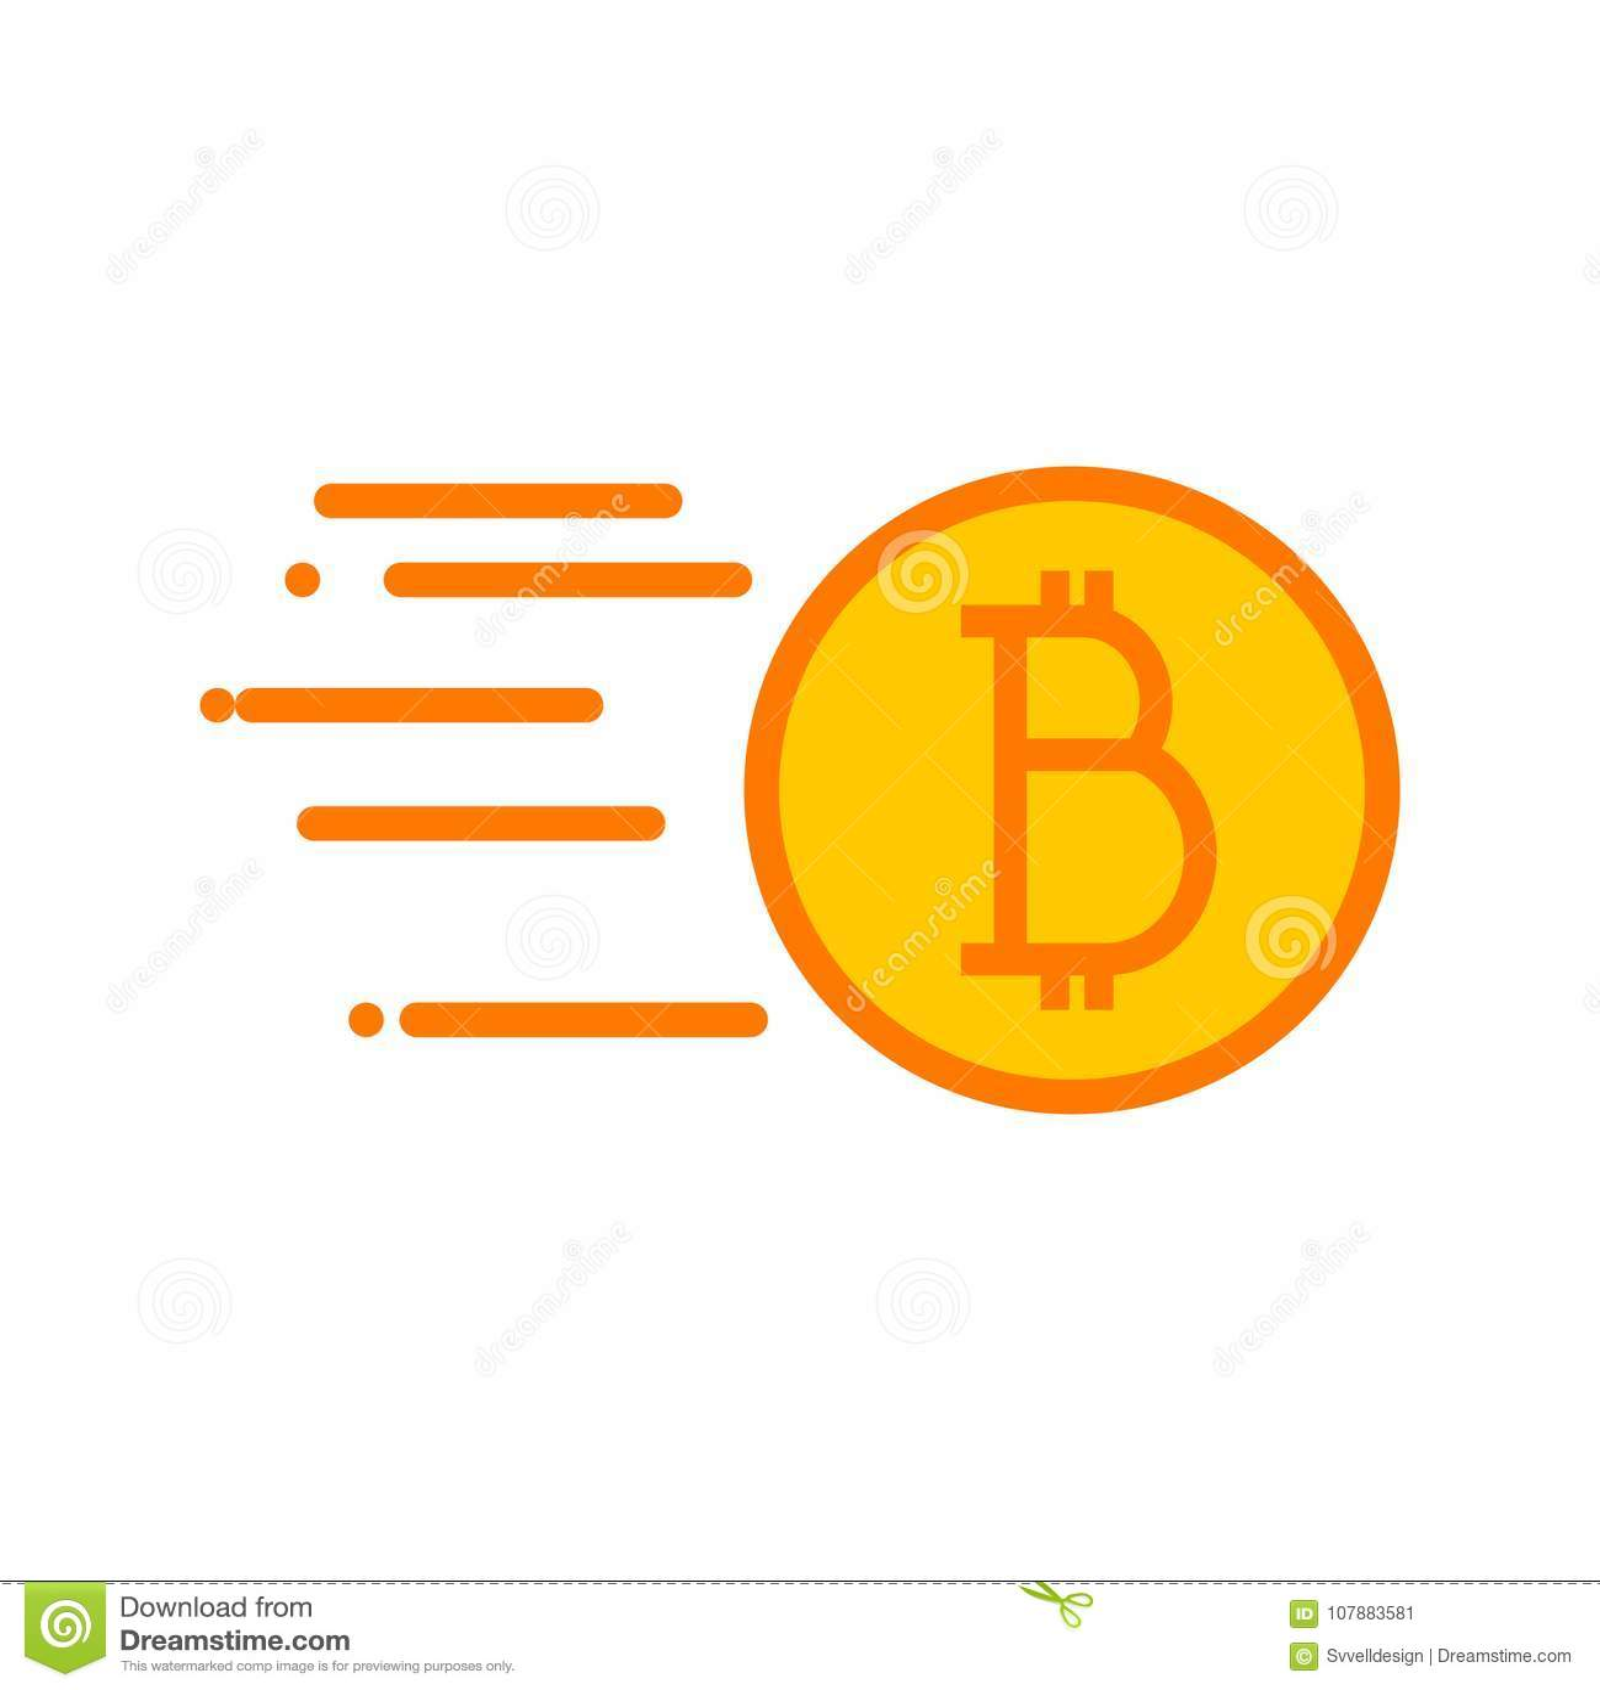 Simple Bitcoin Quick Sending Vector Illustration Graphic